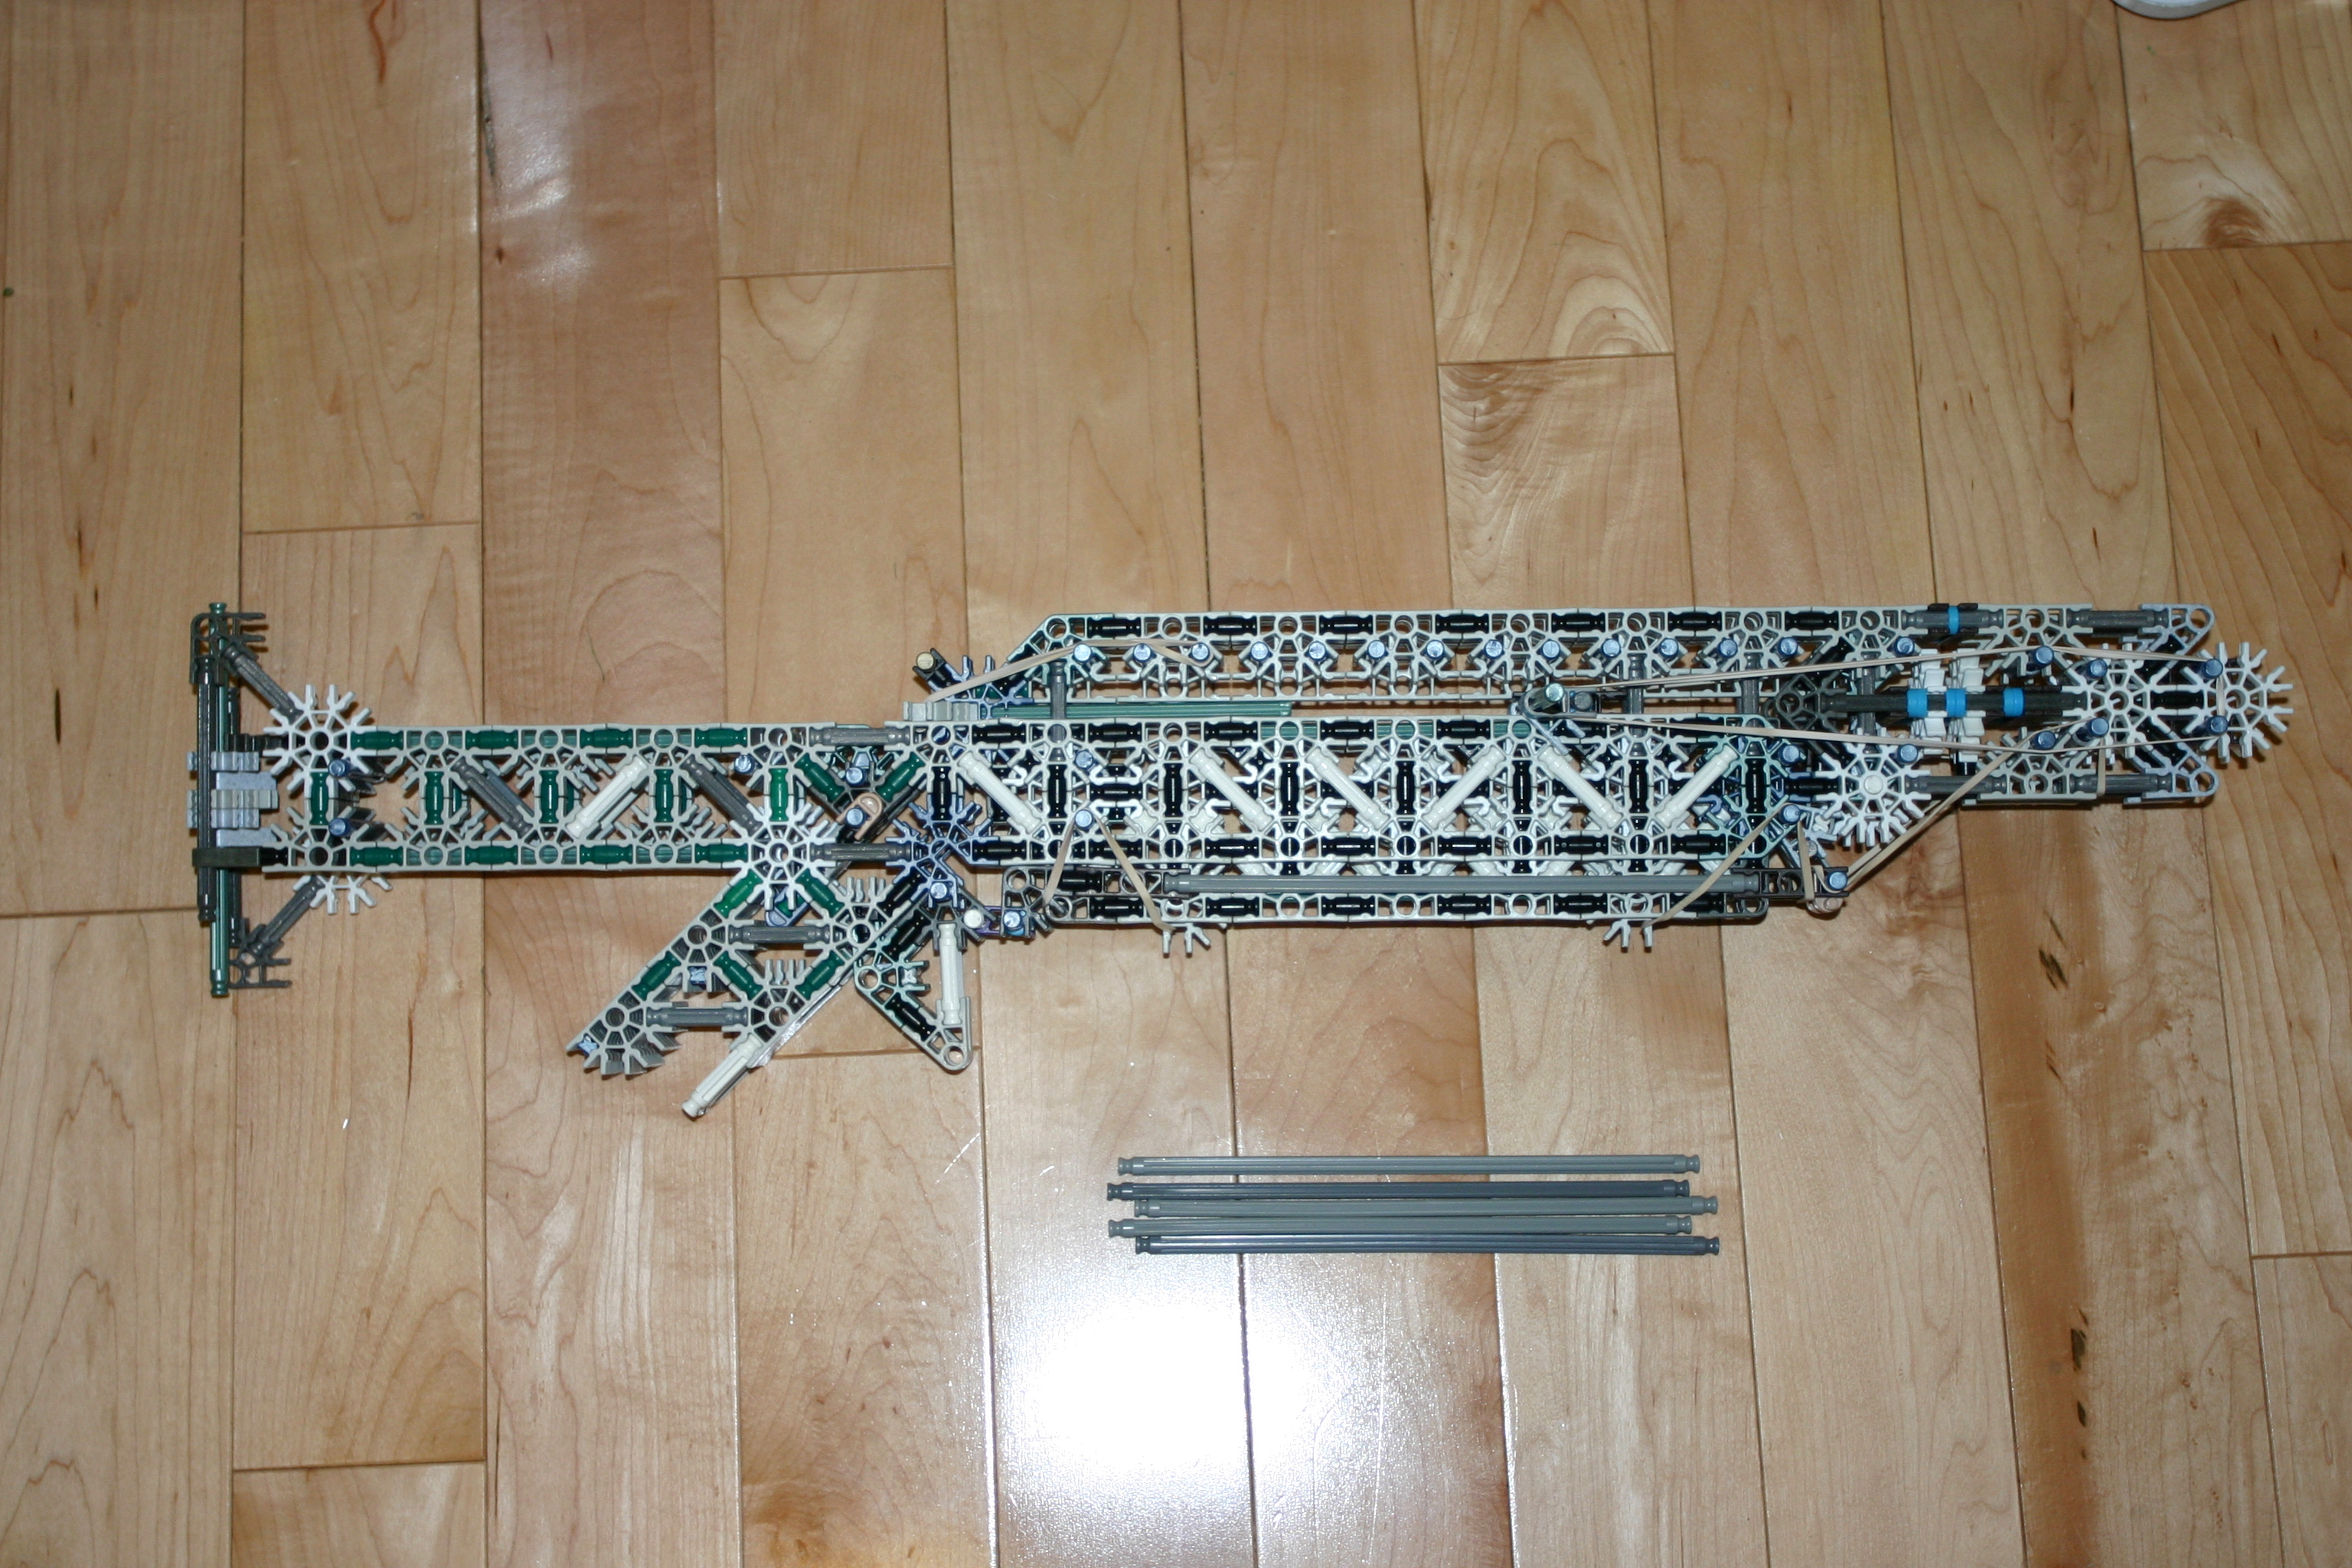 Knetix R-SAR K'nex assault rifle